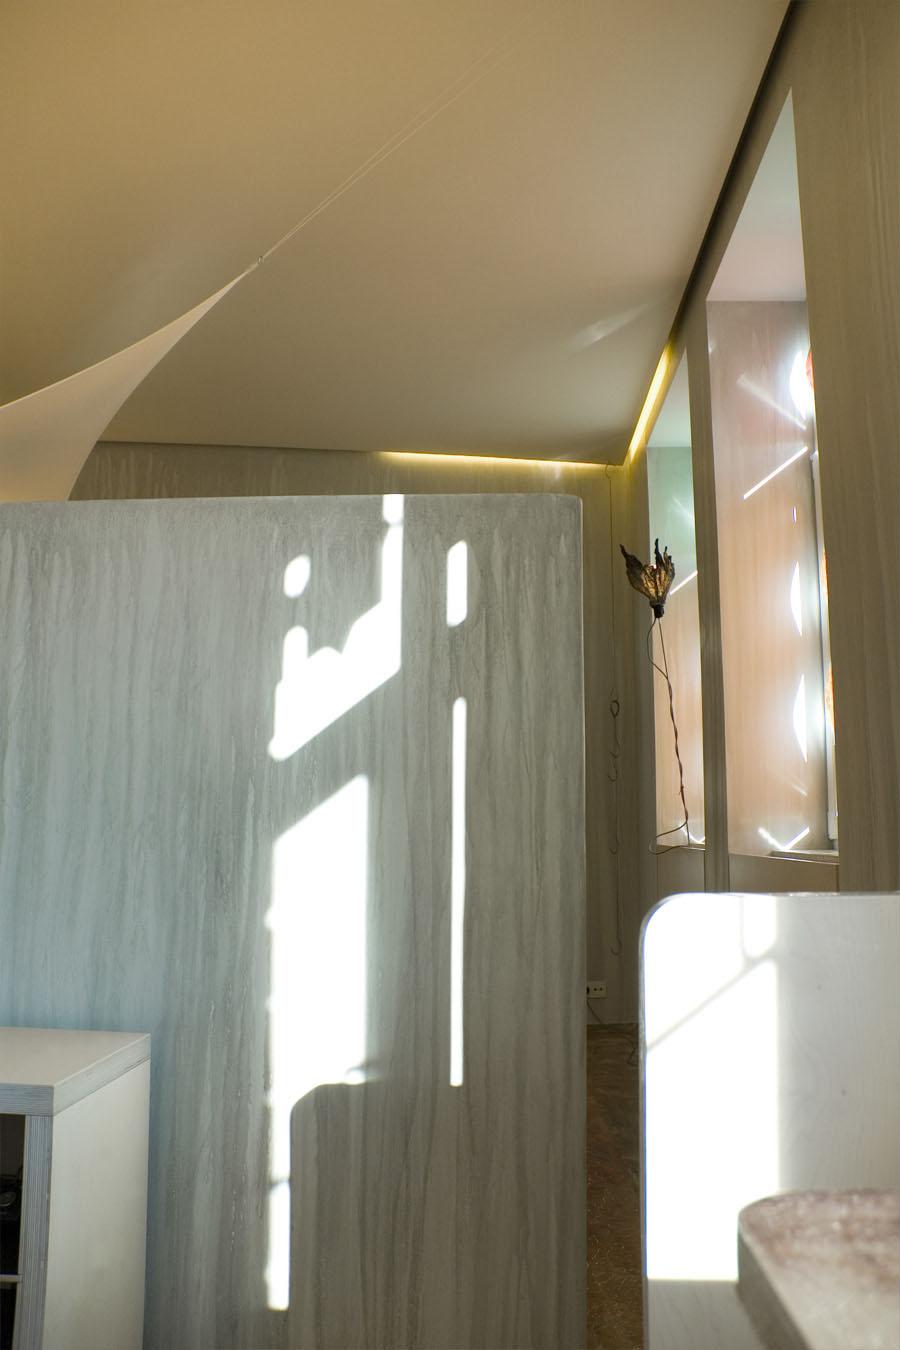 Freydenberg_Apartment_Hotel_39.jpg